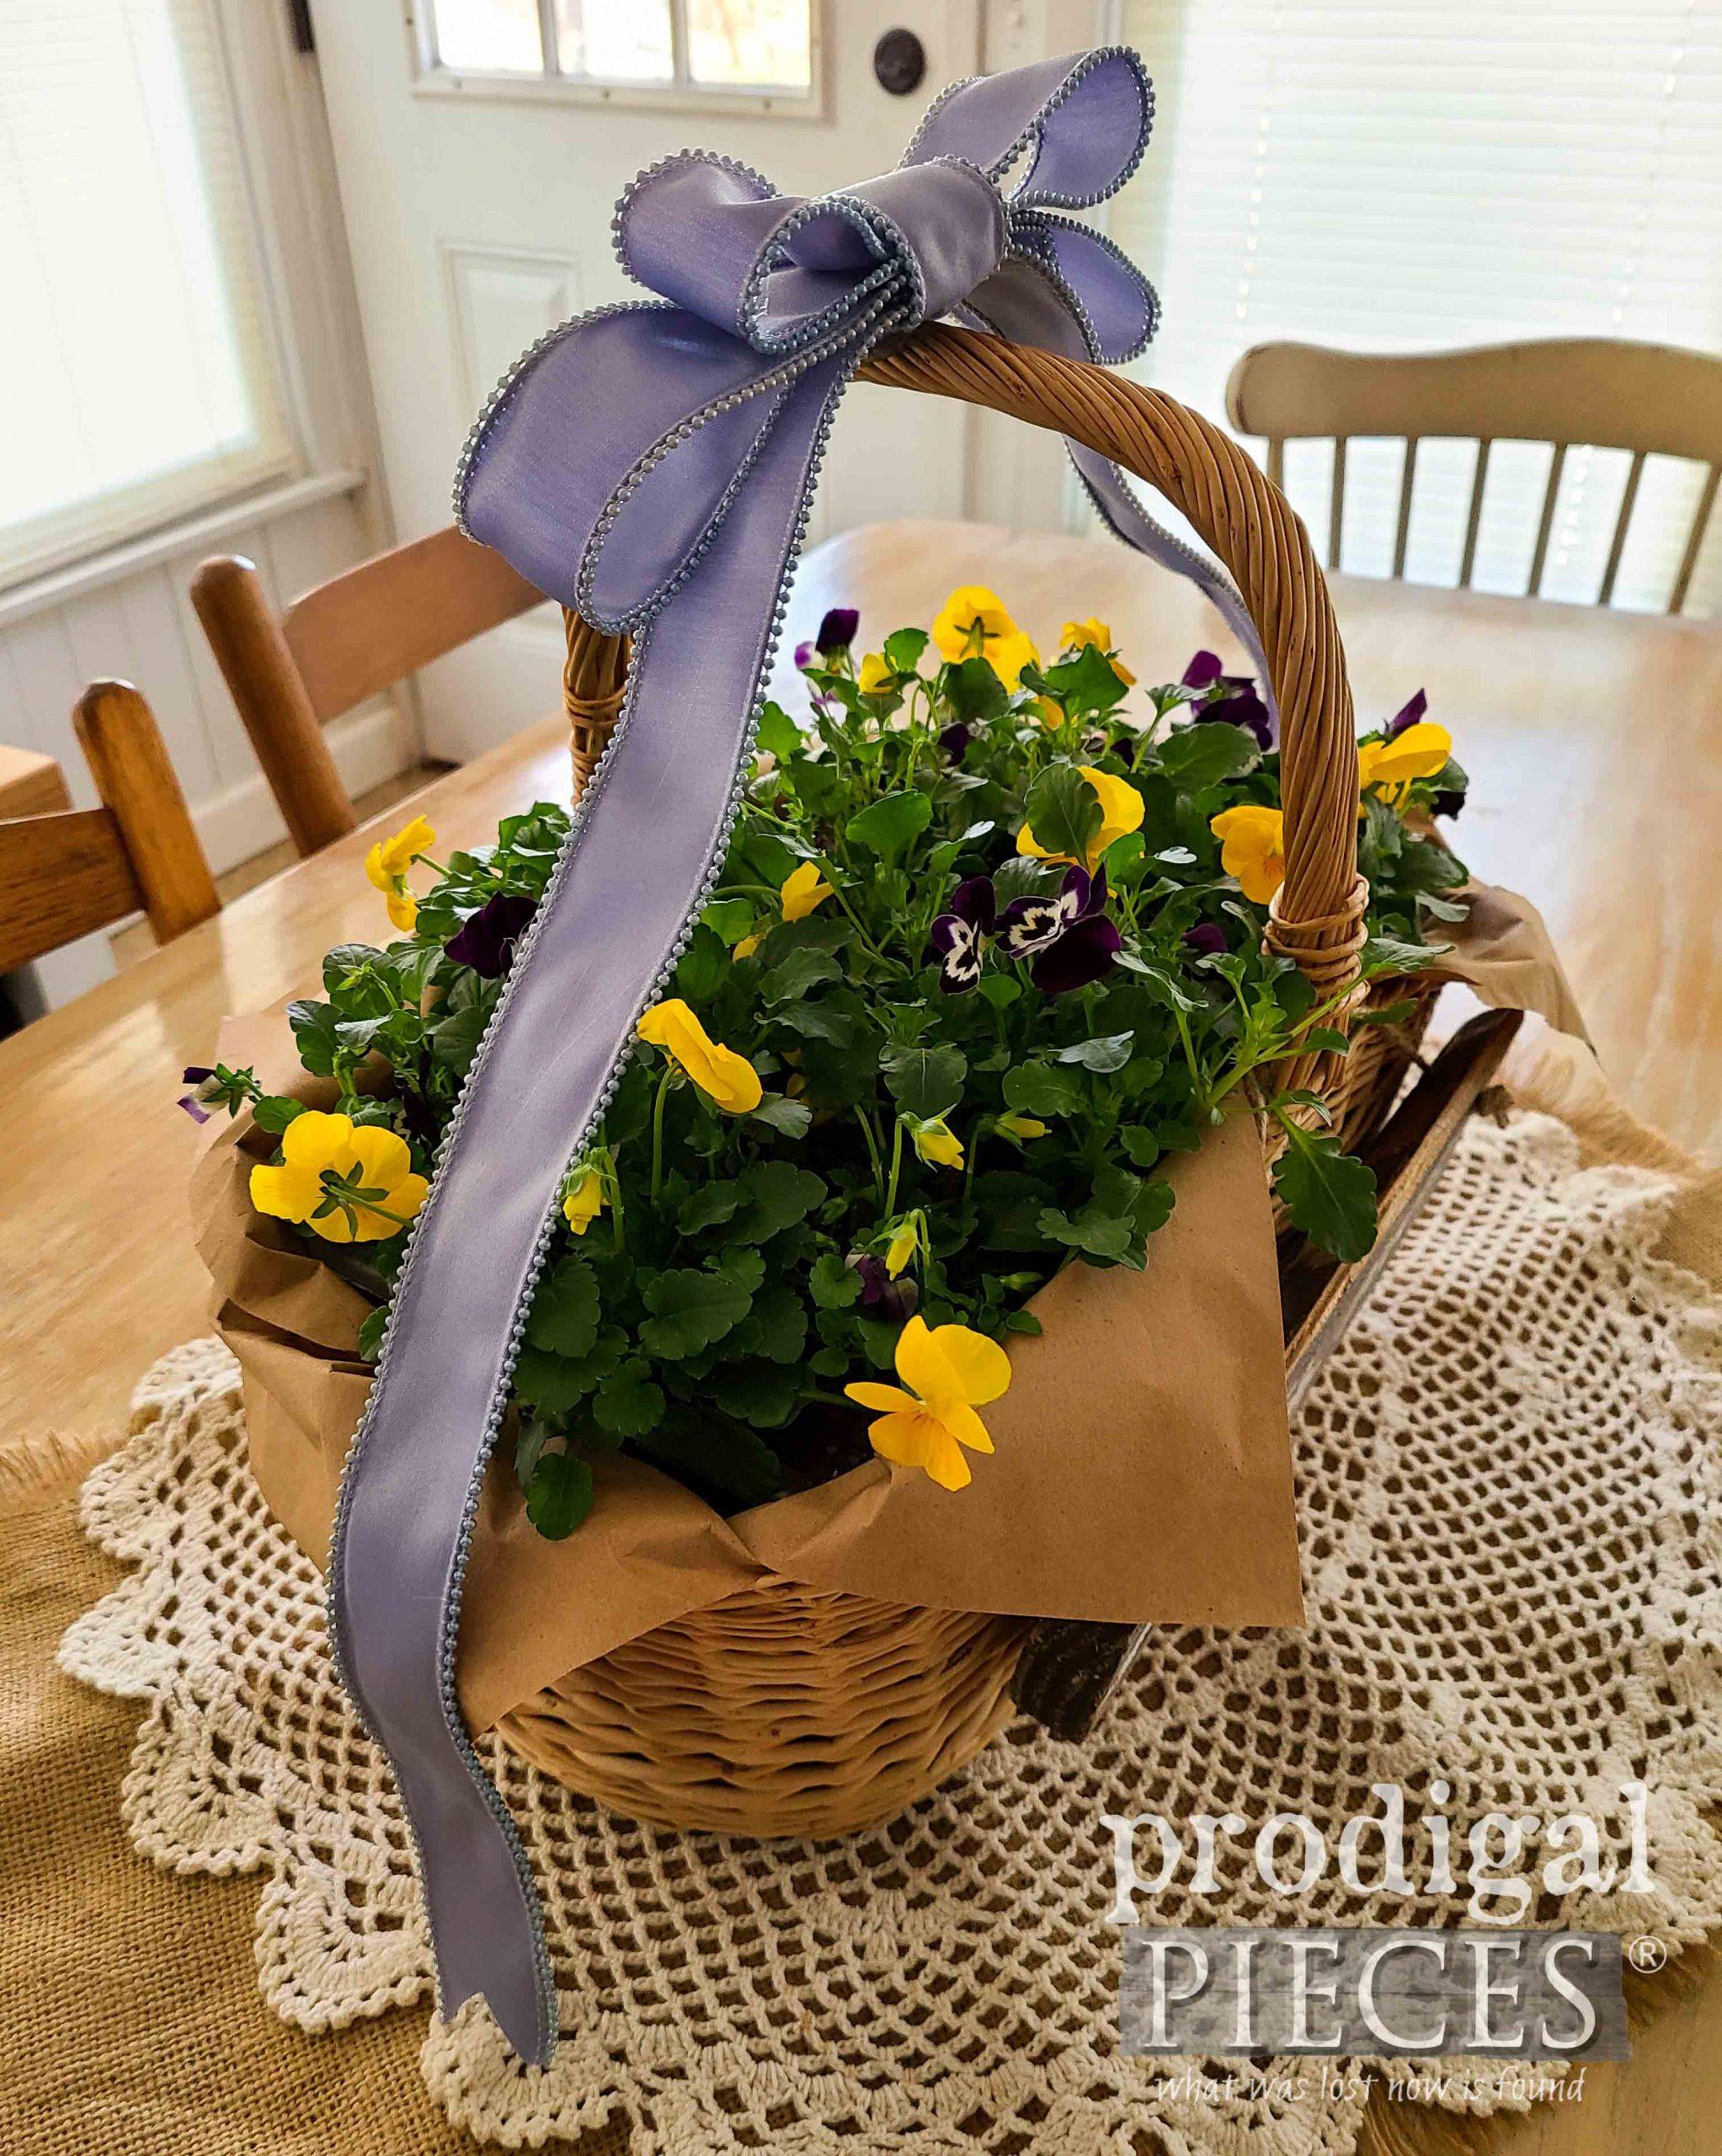 Viola Flower Easter Basket DIY by Larissa of Prodigal Pieces | prodigalpieces.com #prodigalpieces #diy #spring #easter #home #flowers